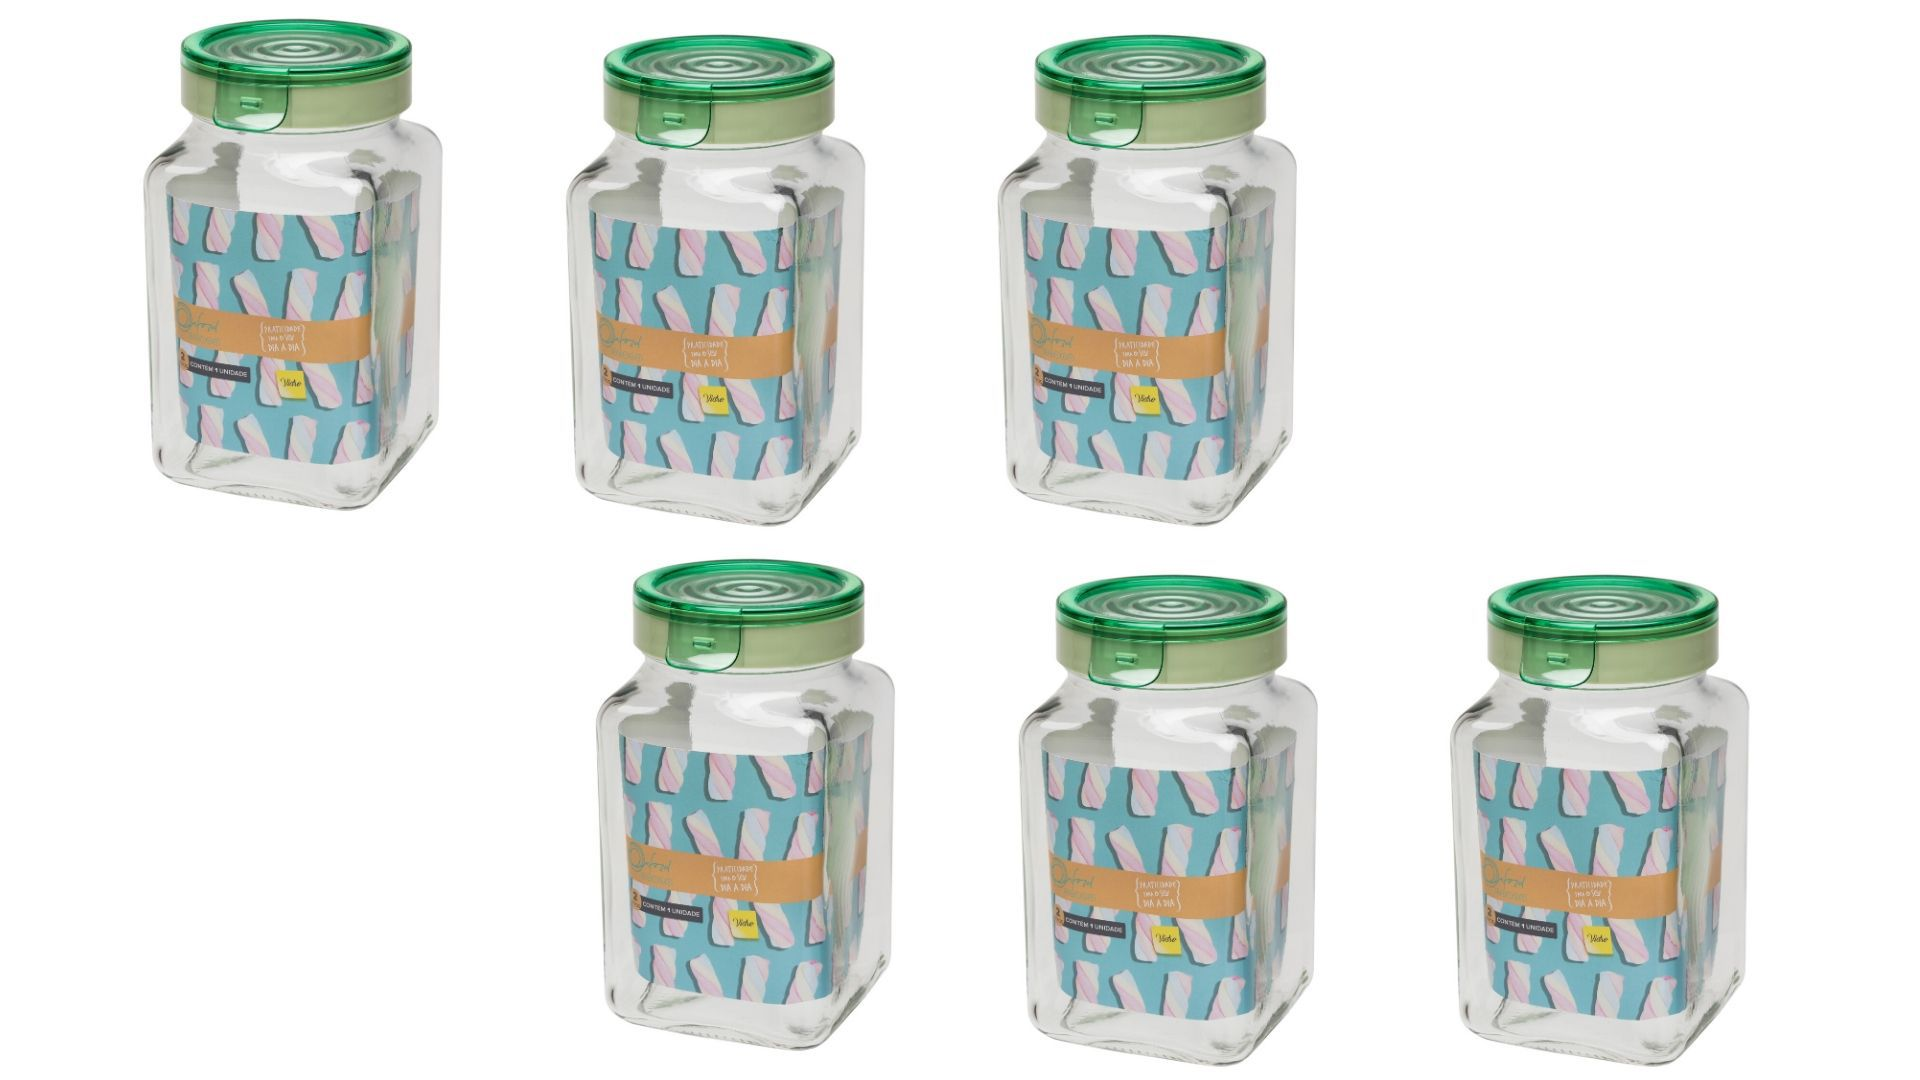 Conjunto De 6 Potes Herméticos De Vidro 2 Litros P/ Mantimentos Oxford